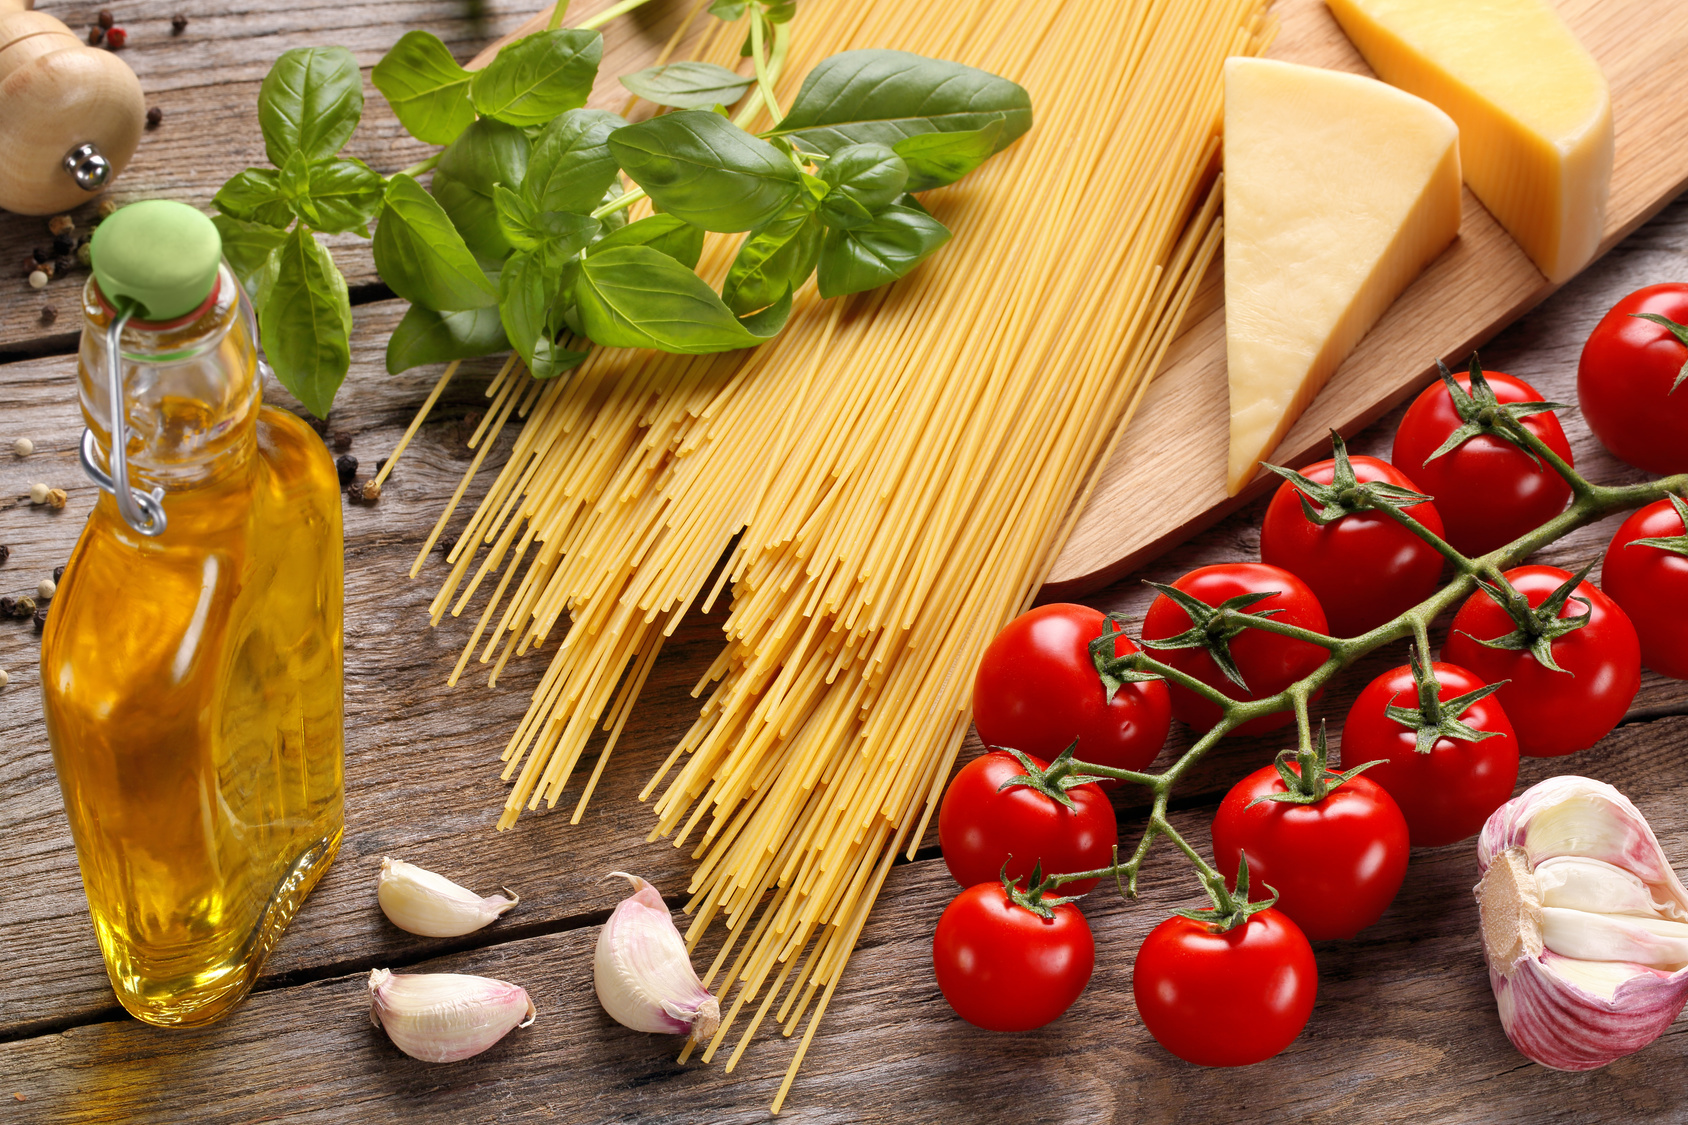 Italian food ingredients on wooden background